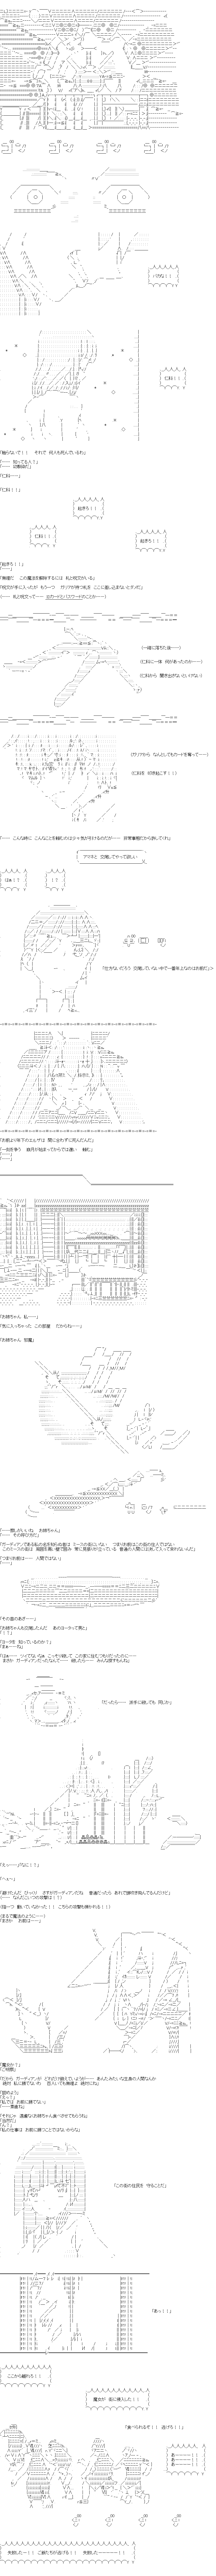 f:id:bottle512:20190528223838p:plain